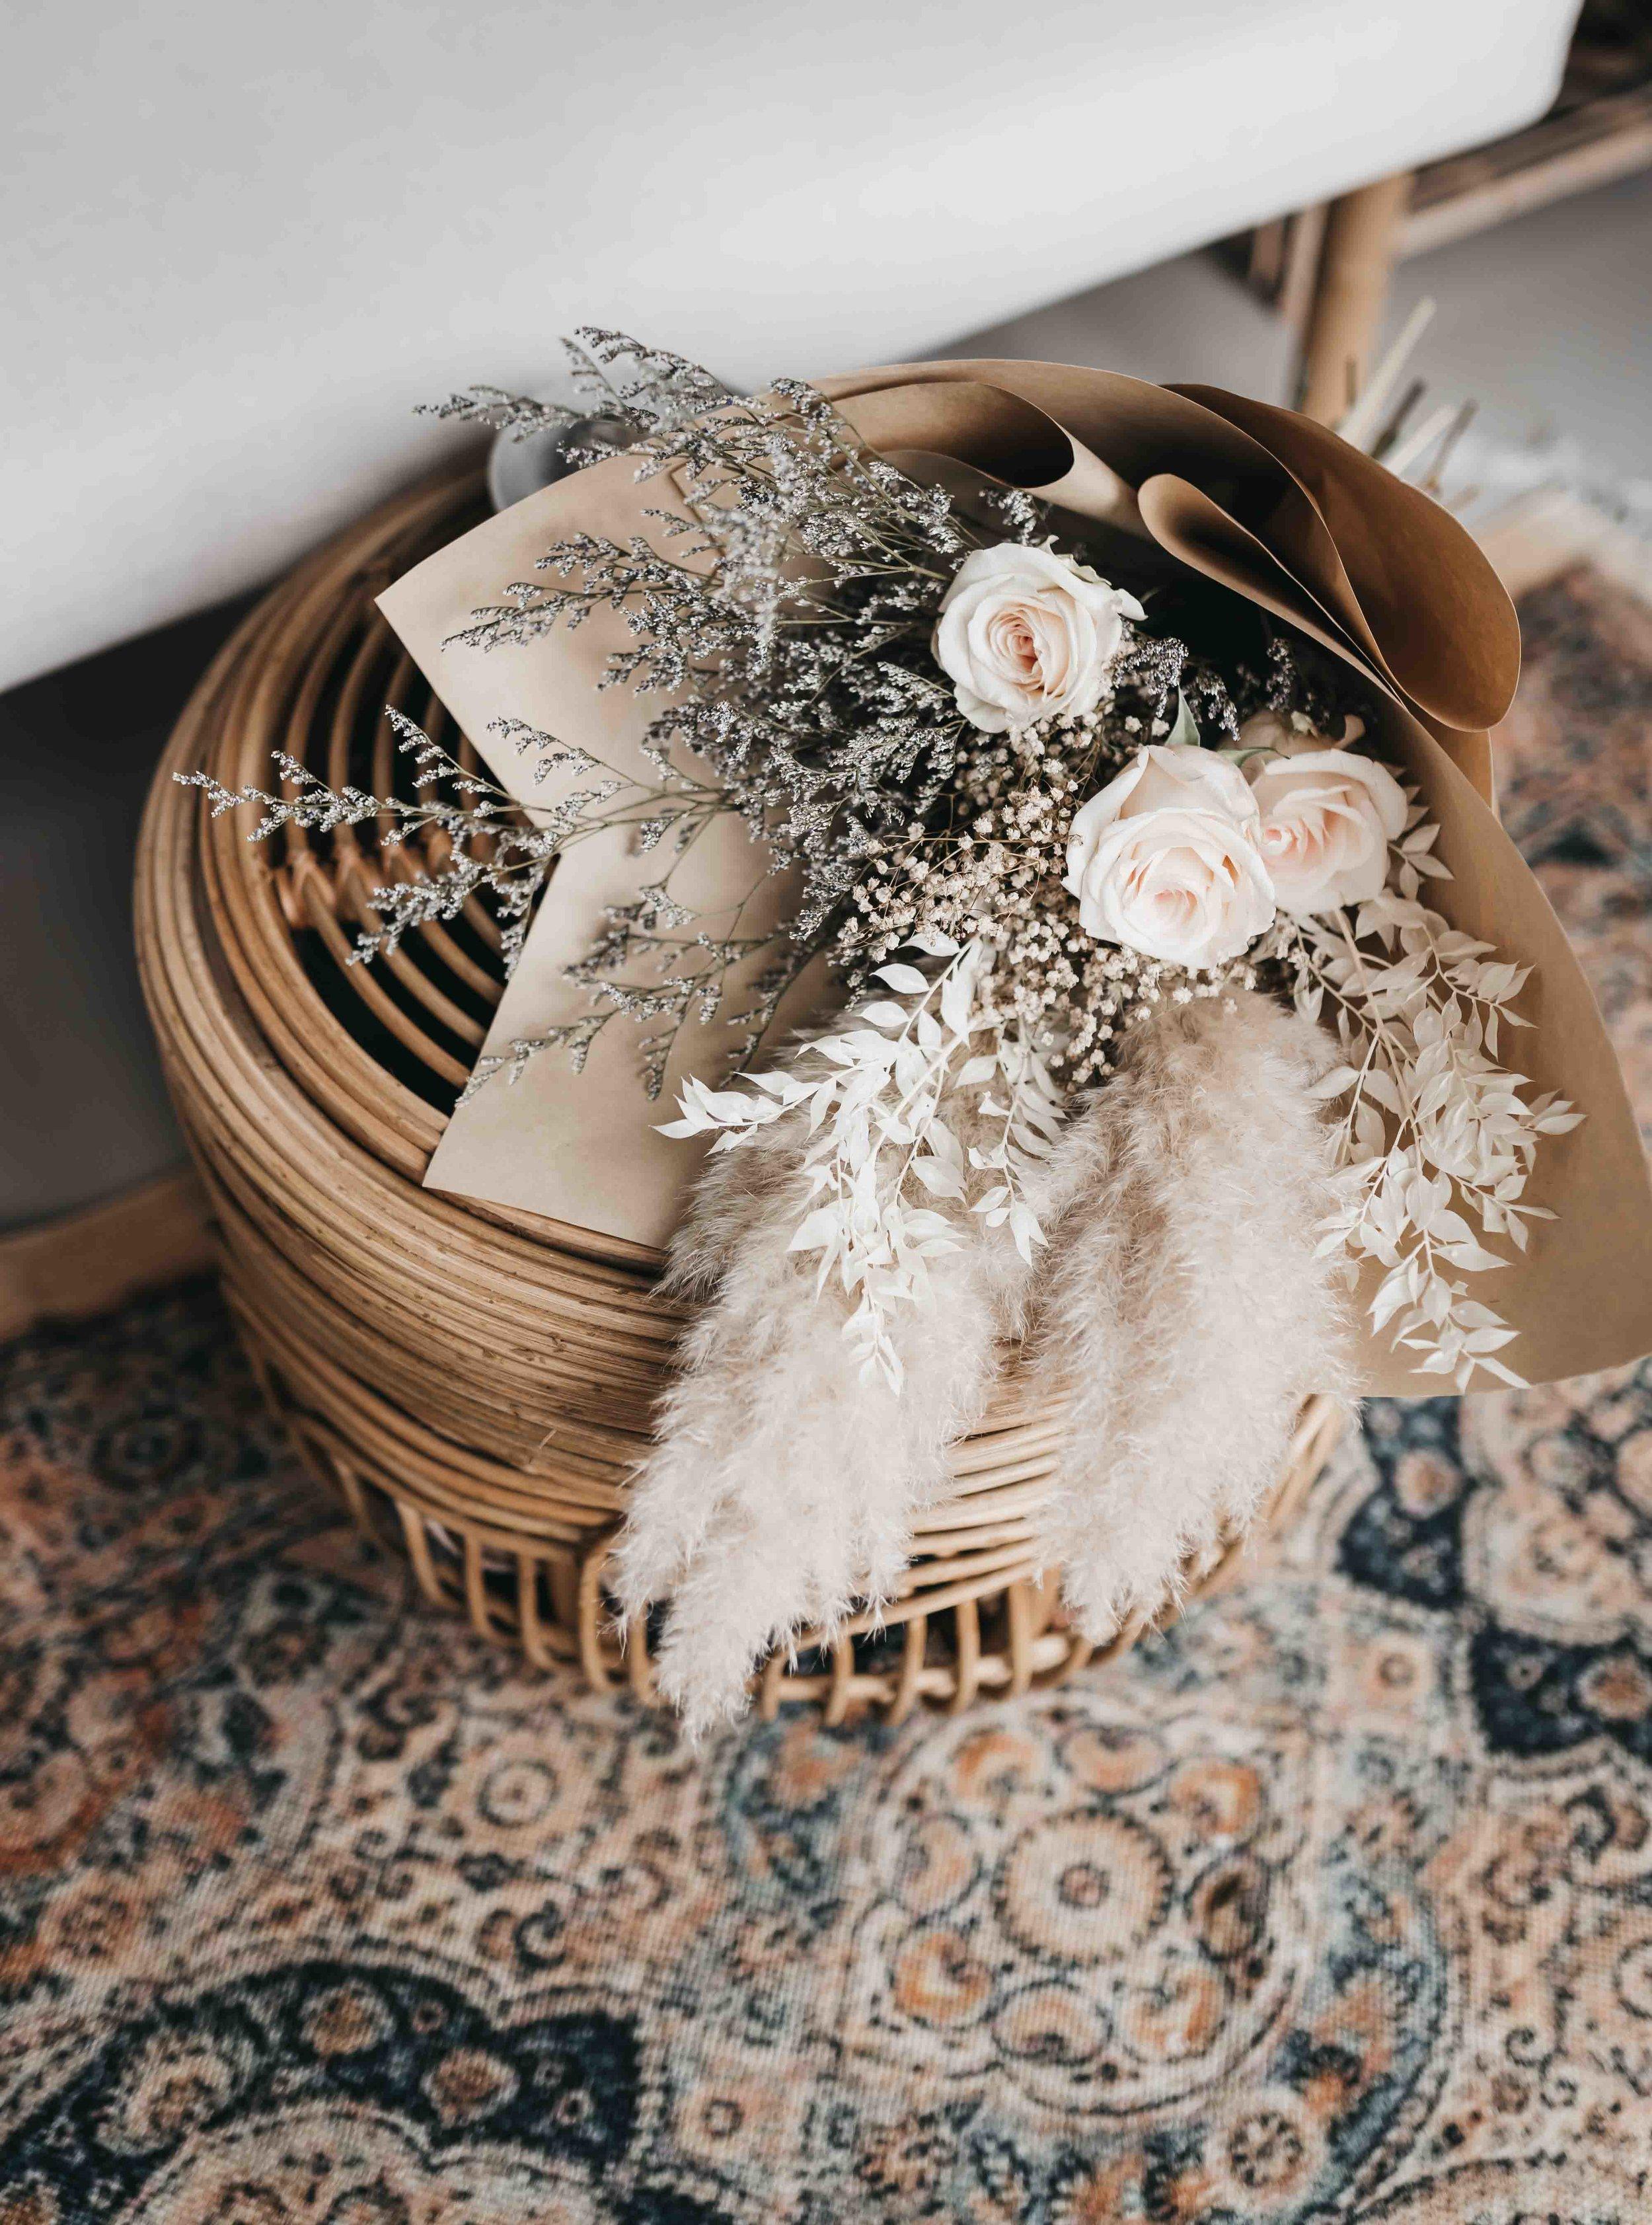 Keira-Mason-Hazel-and-folk-flowers.jpg